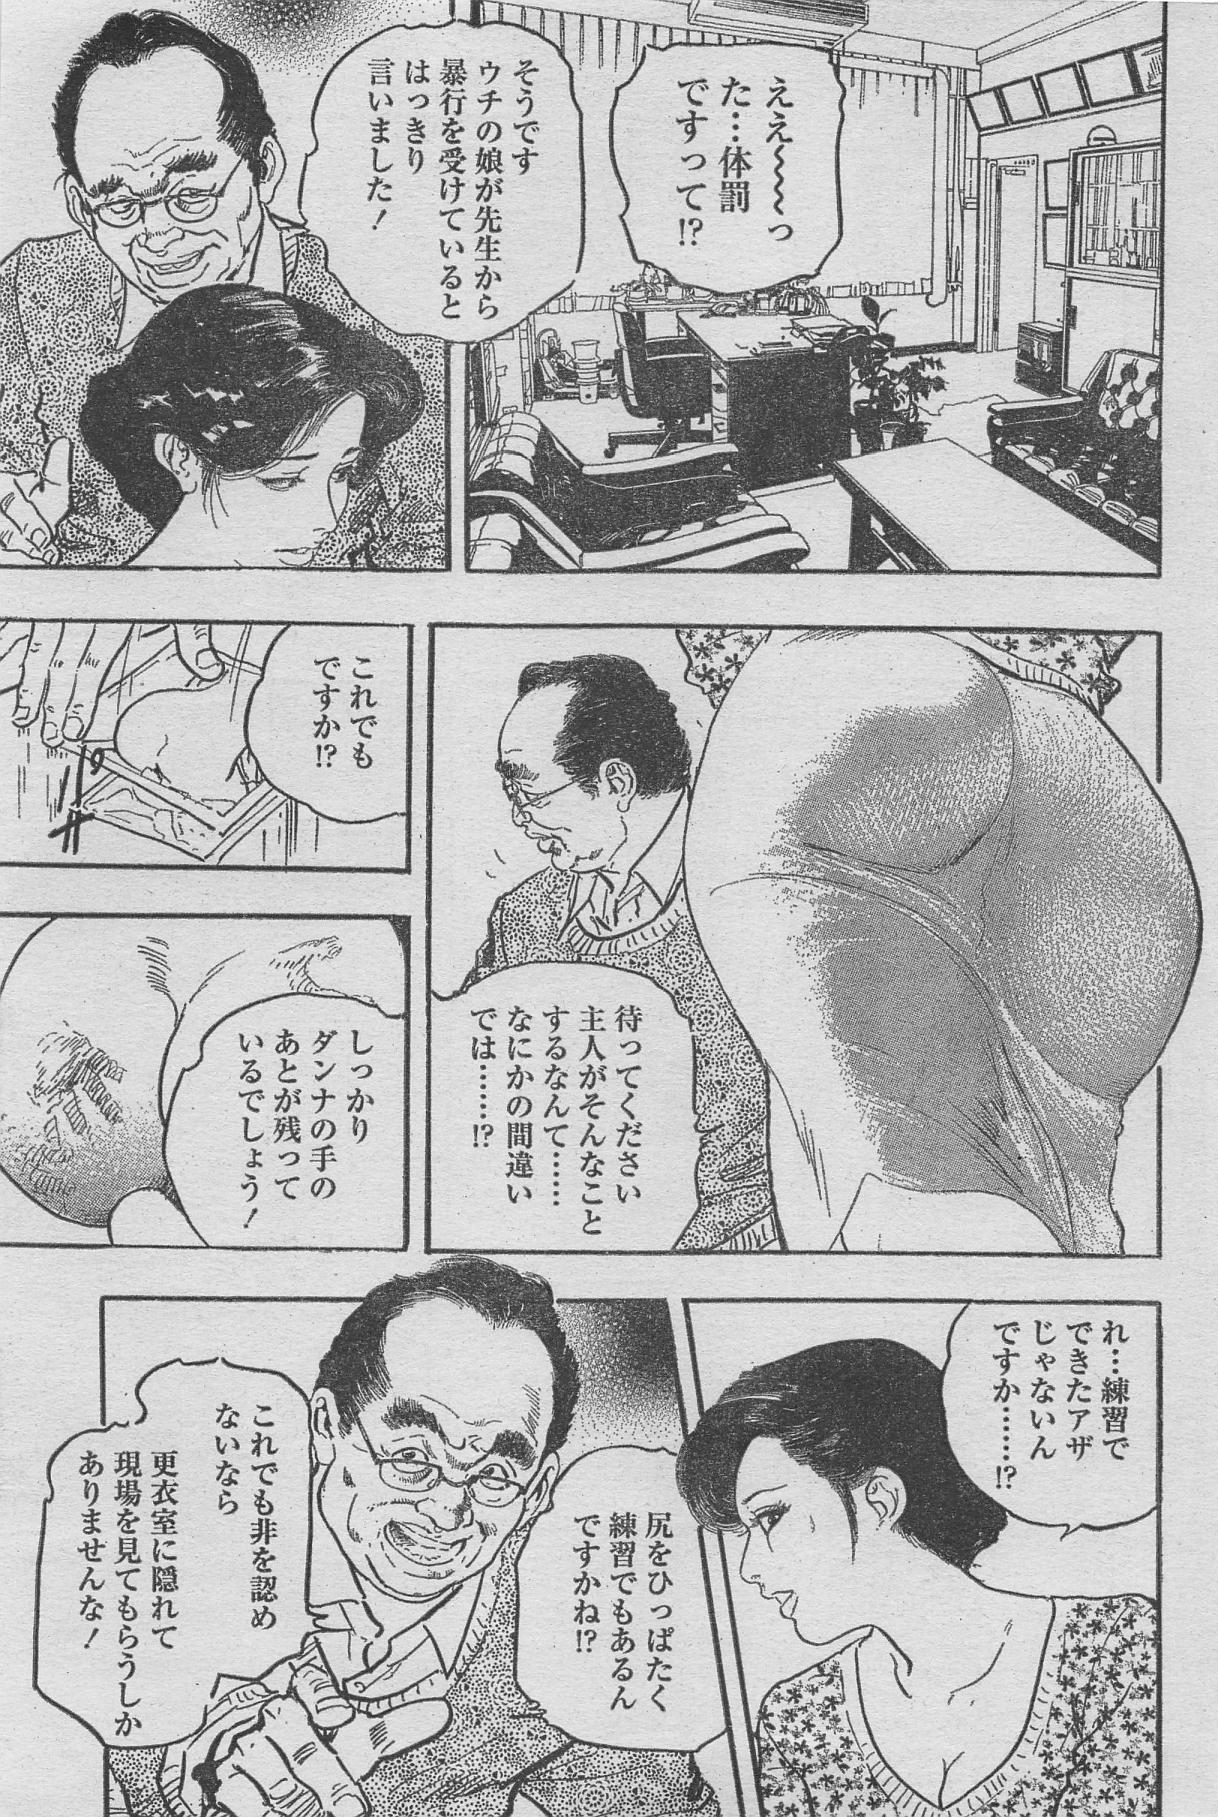 Manga Lawrence 2013-04 152